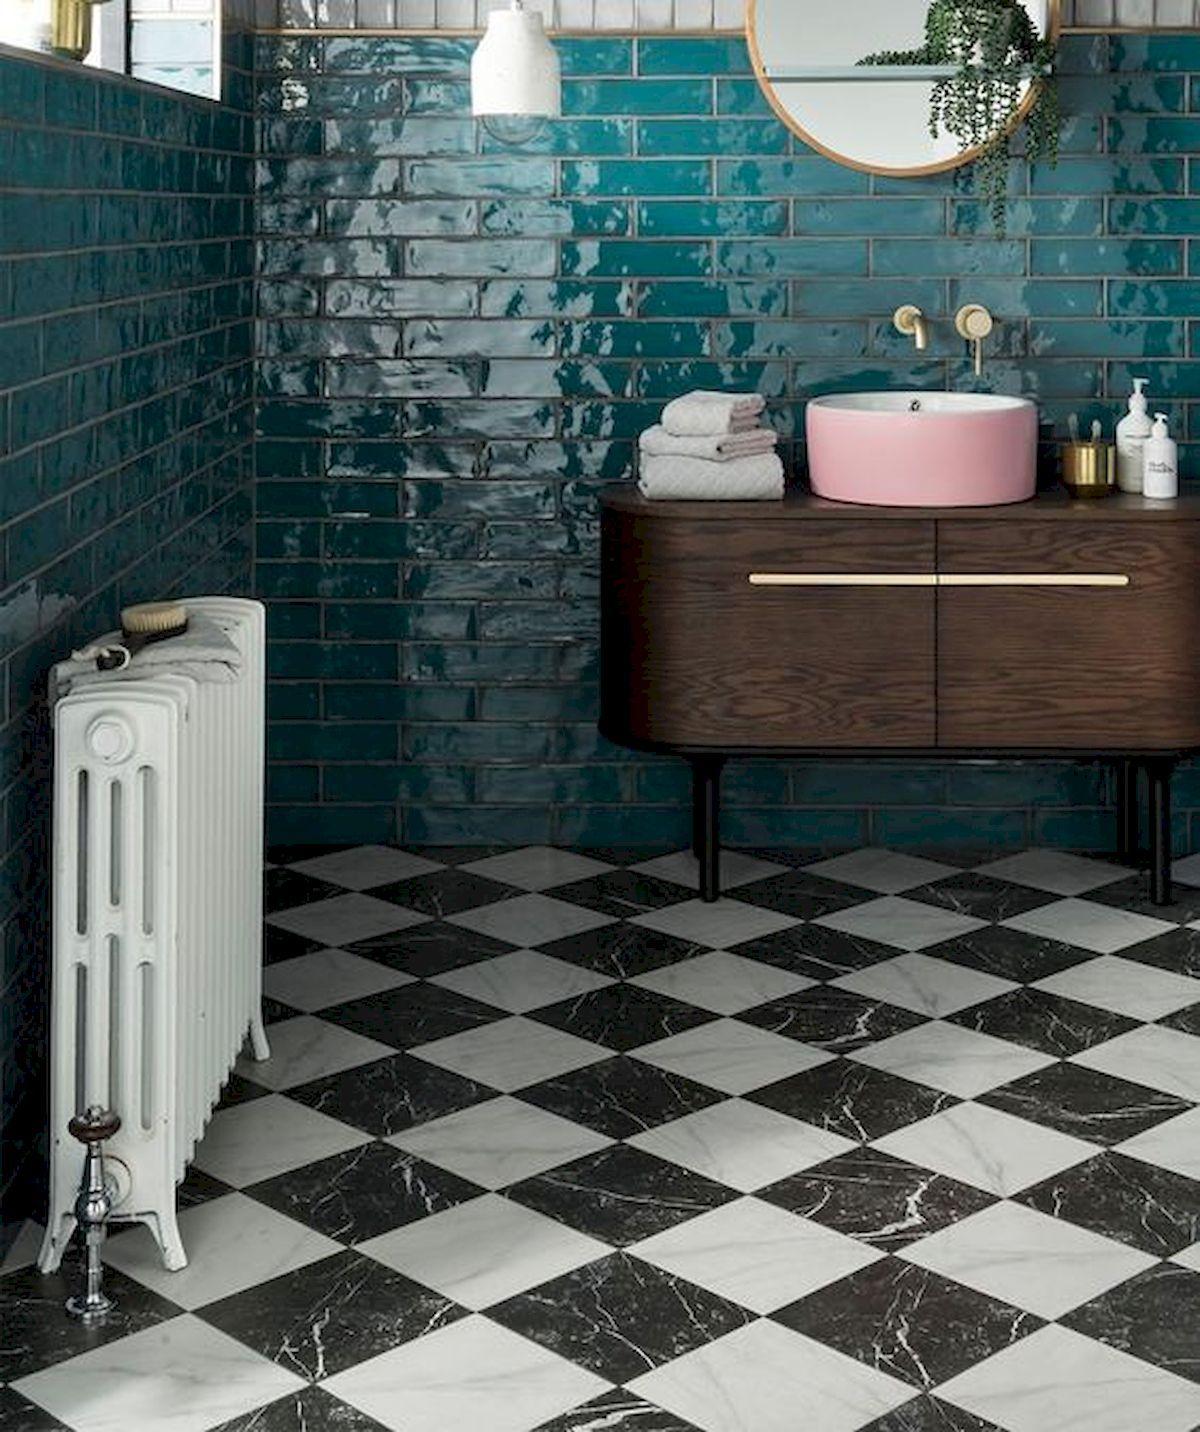 33 Fantastic Bathroom Tile Design Ideas33decor Bathroom Tile Designs Tile Bathroom Teal Bathroom